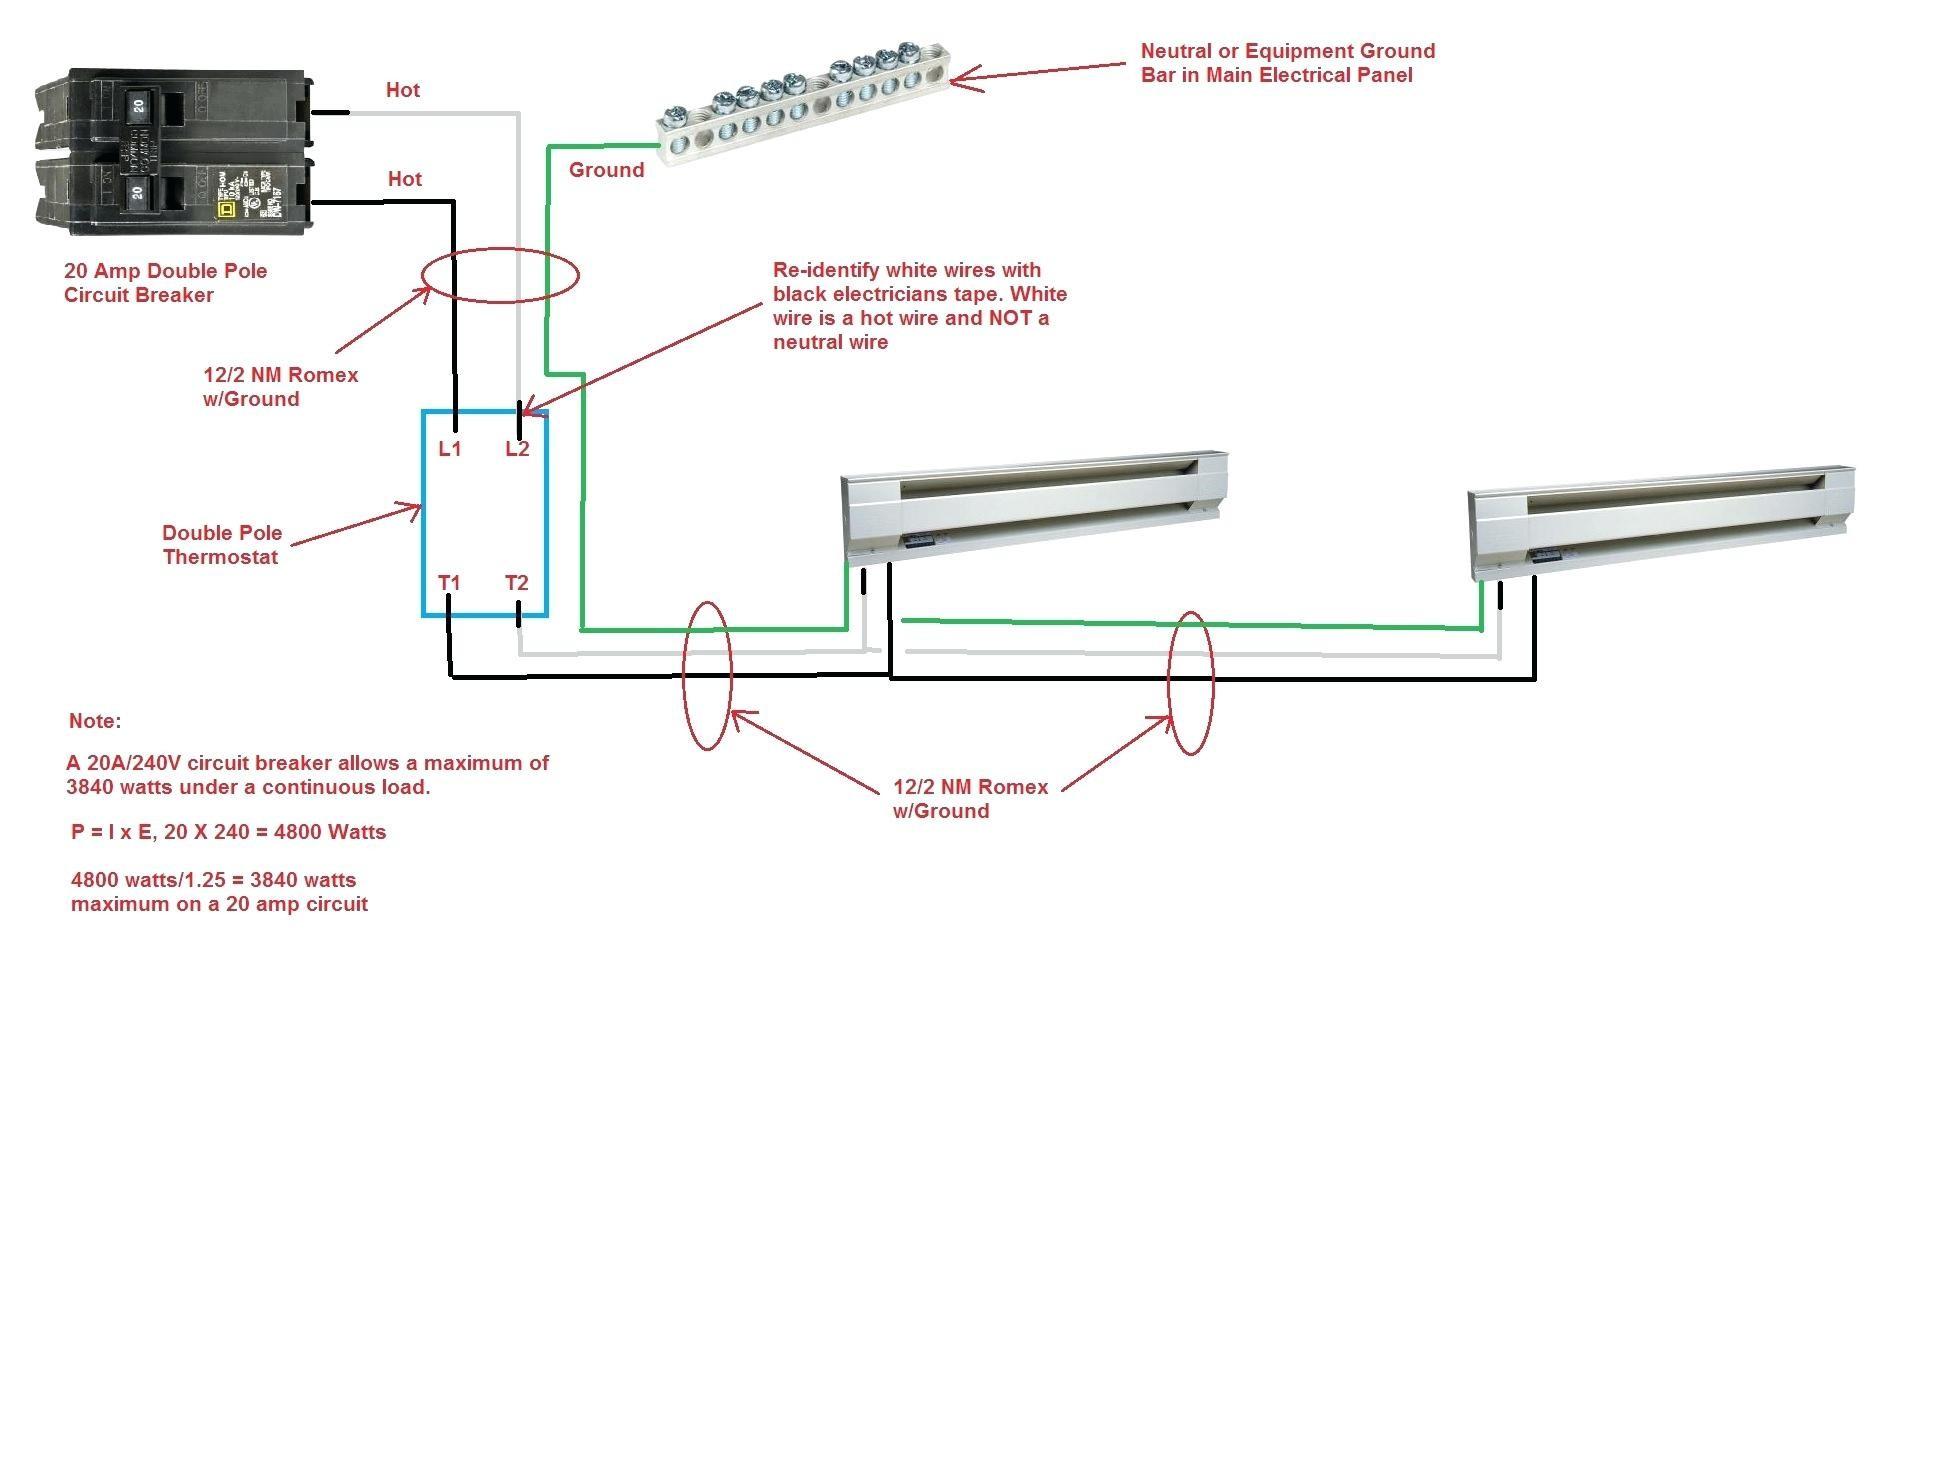 new wiring diagram 2 baseboard heaters 1 thermostat rccarsusa rh rccarsusa Wiring a 220V Baseboard Heater Wiring a 240V Baseboard Heater